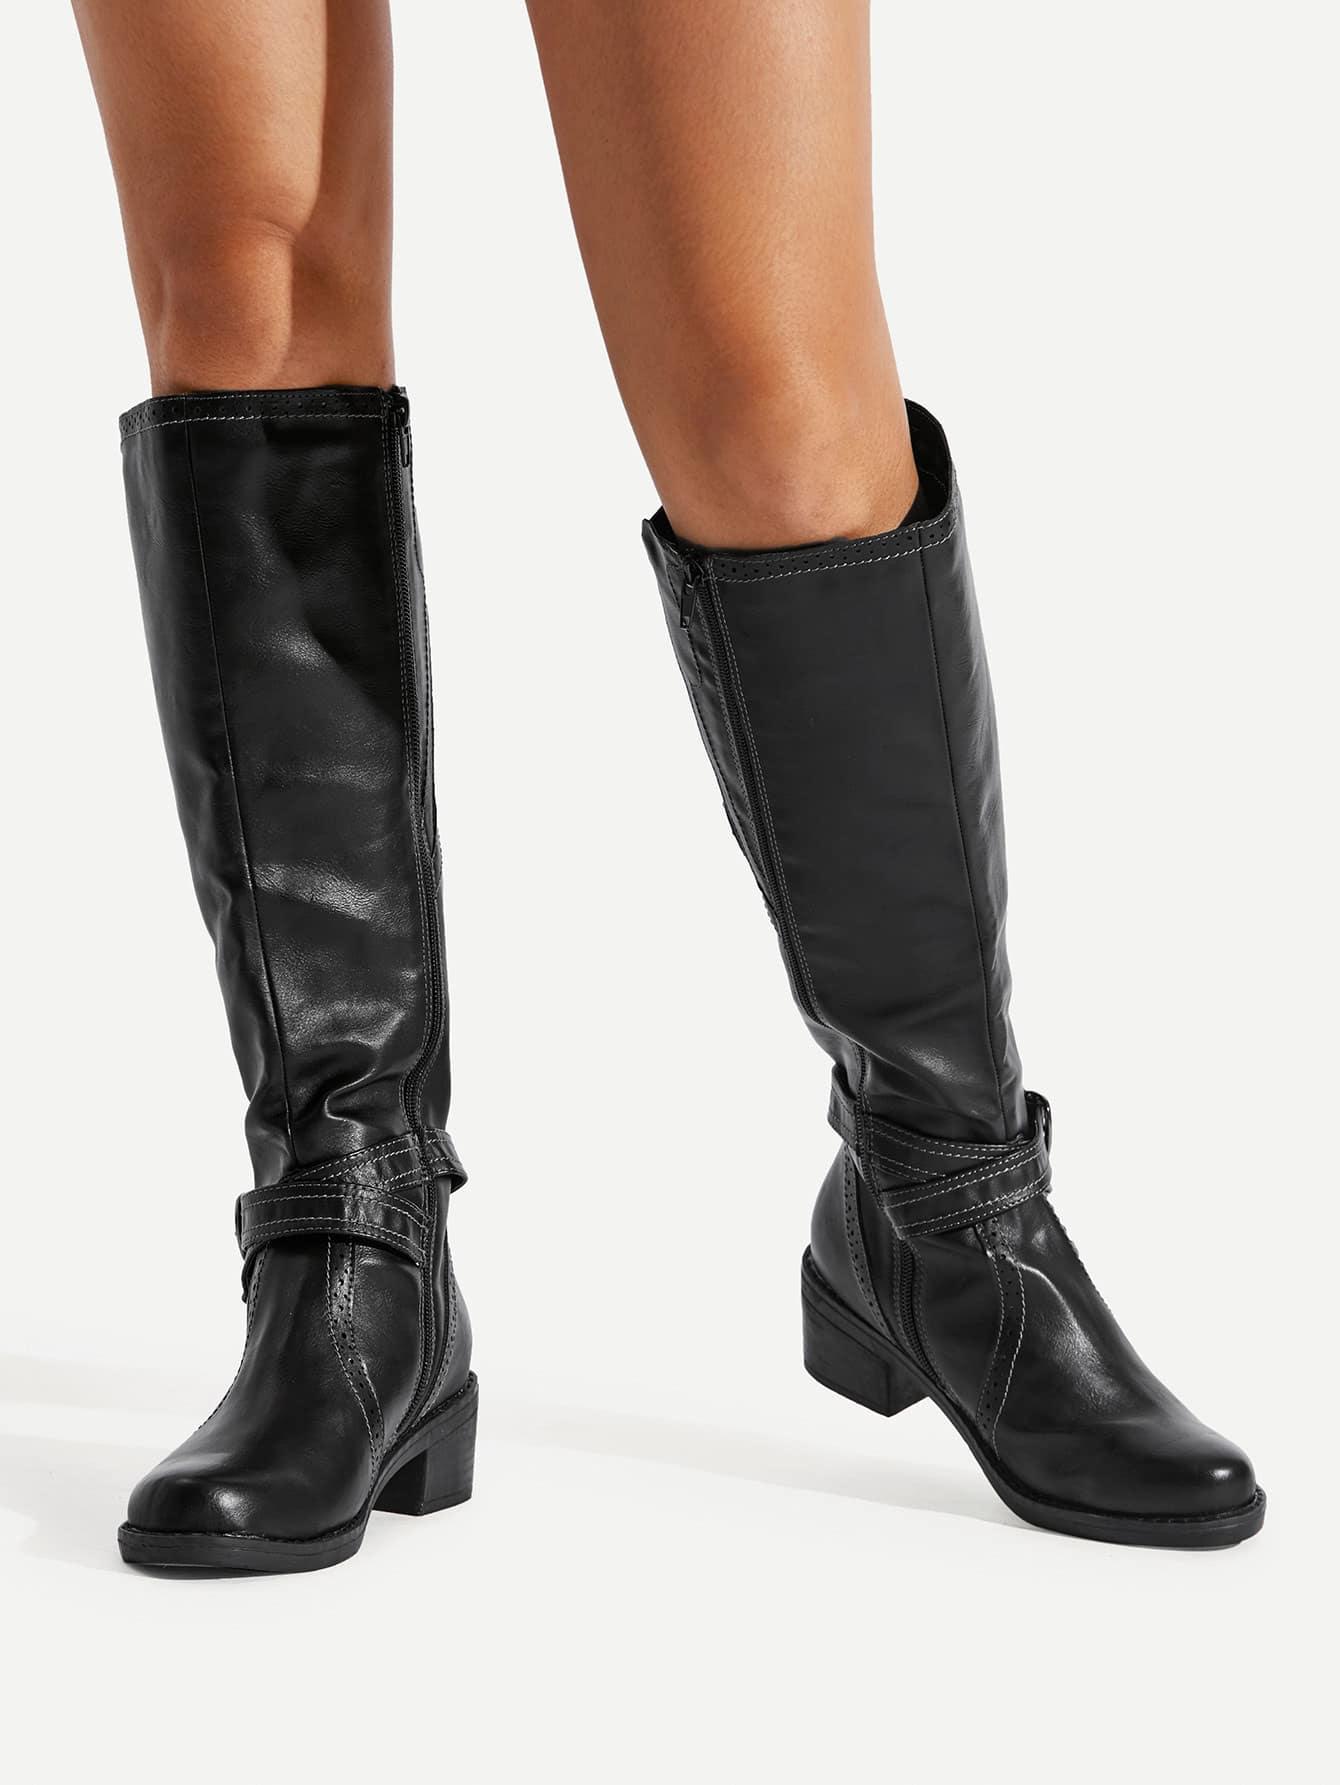 Buckle Side Knee High PU Boots